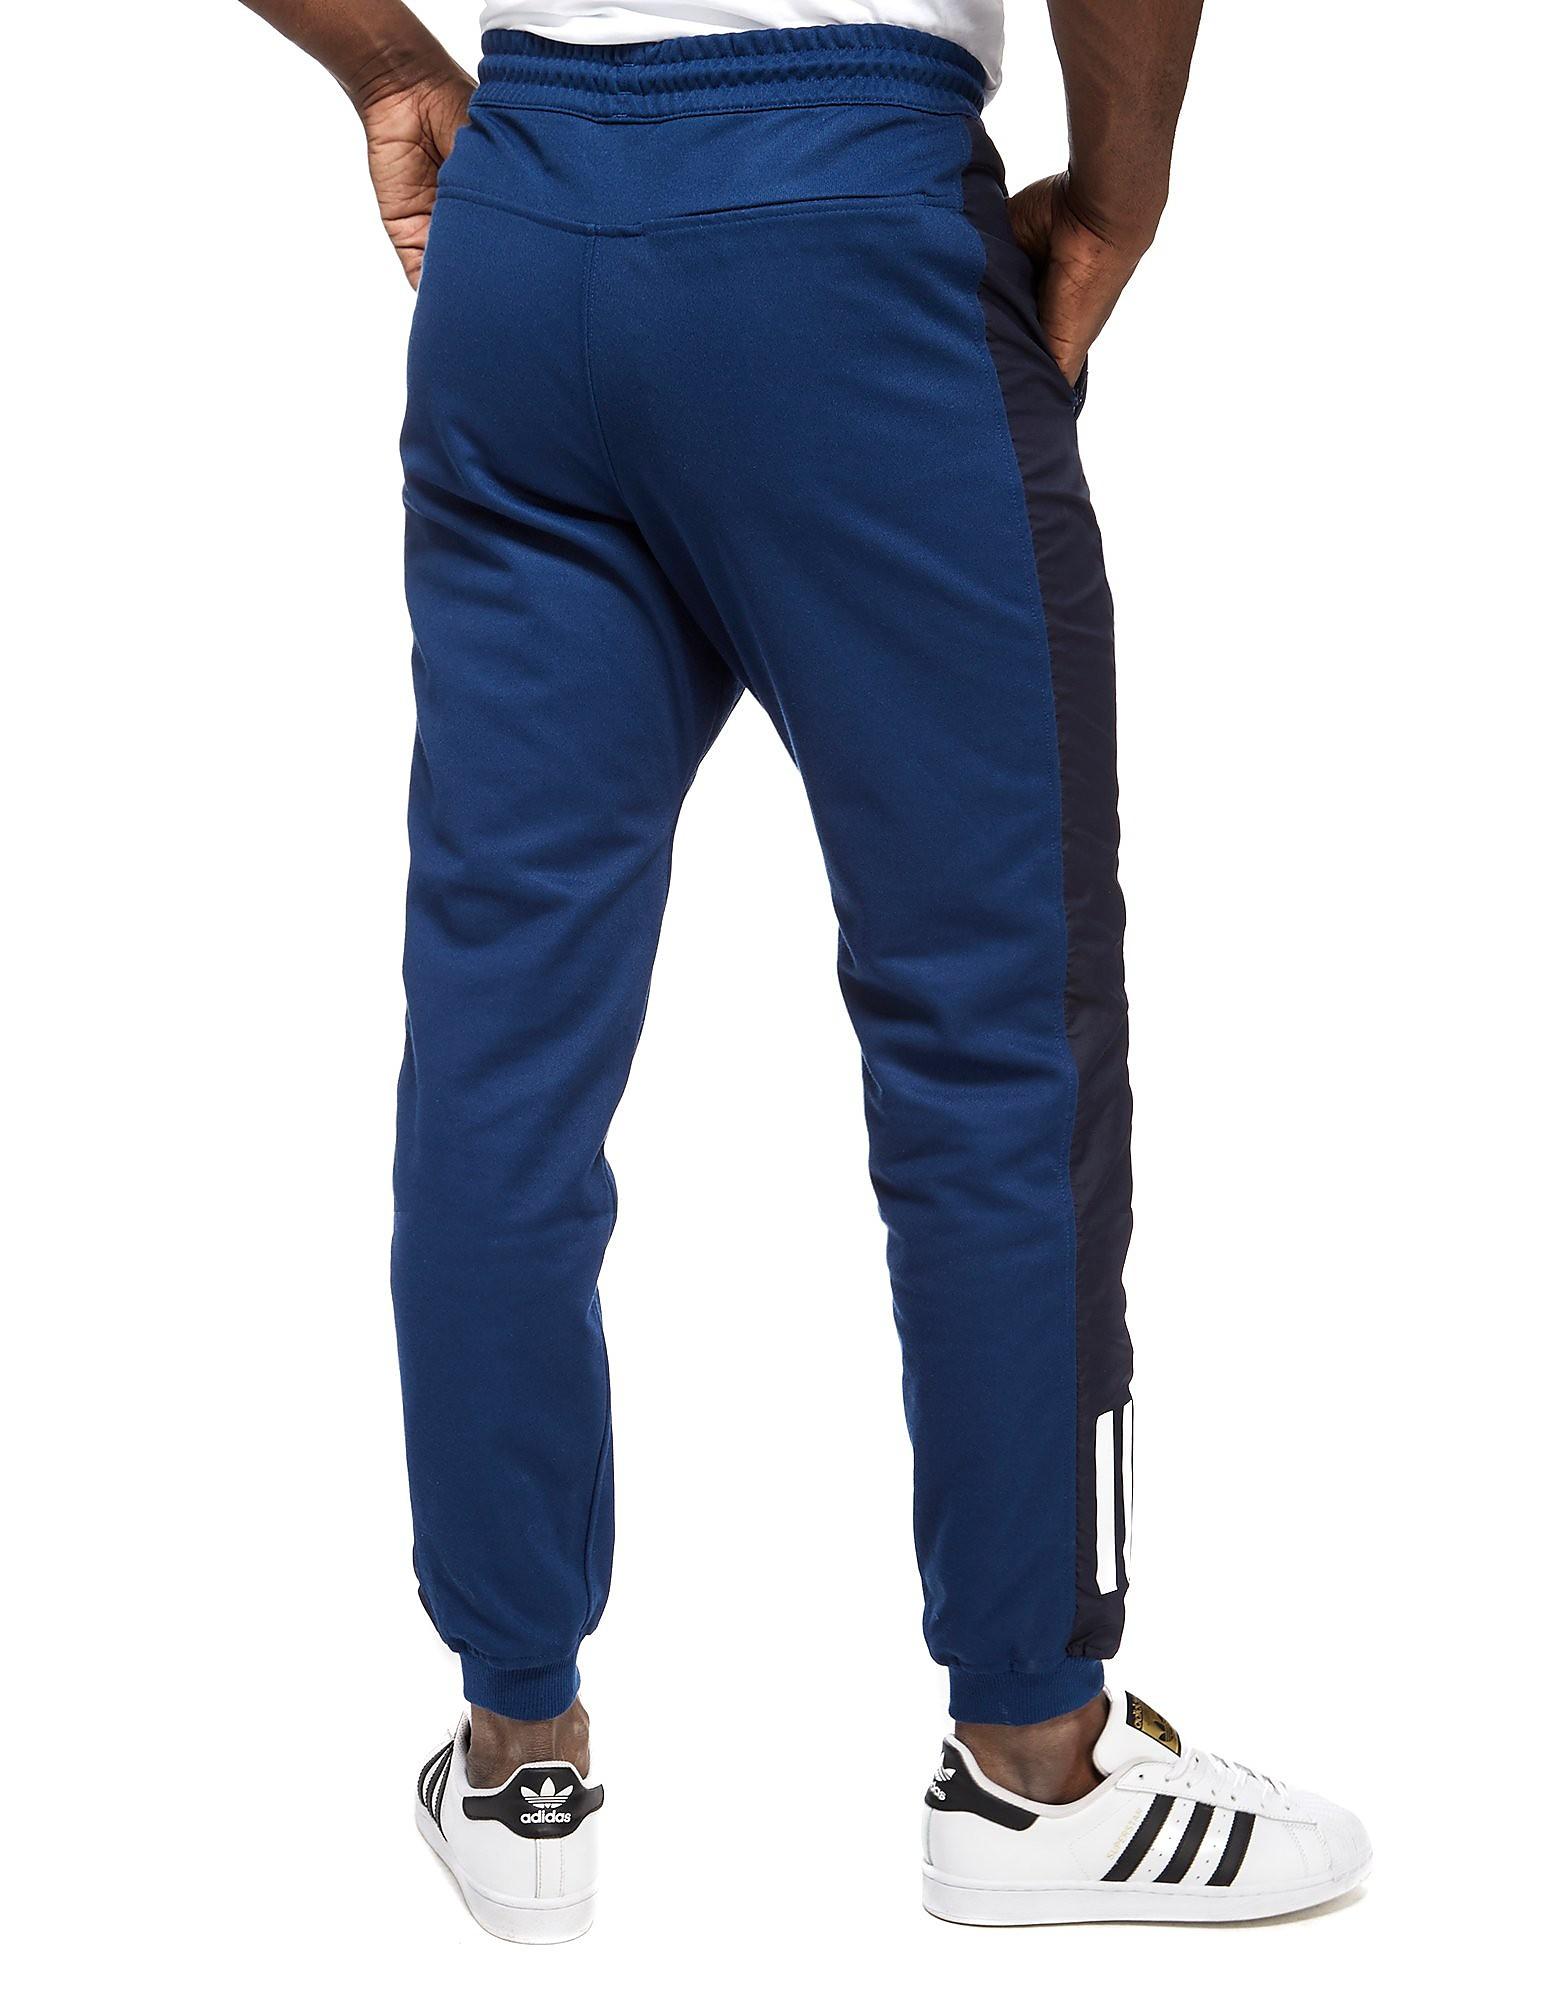 adidas Originals Doom Fabric Mix Pants